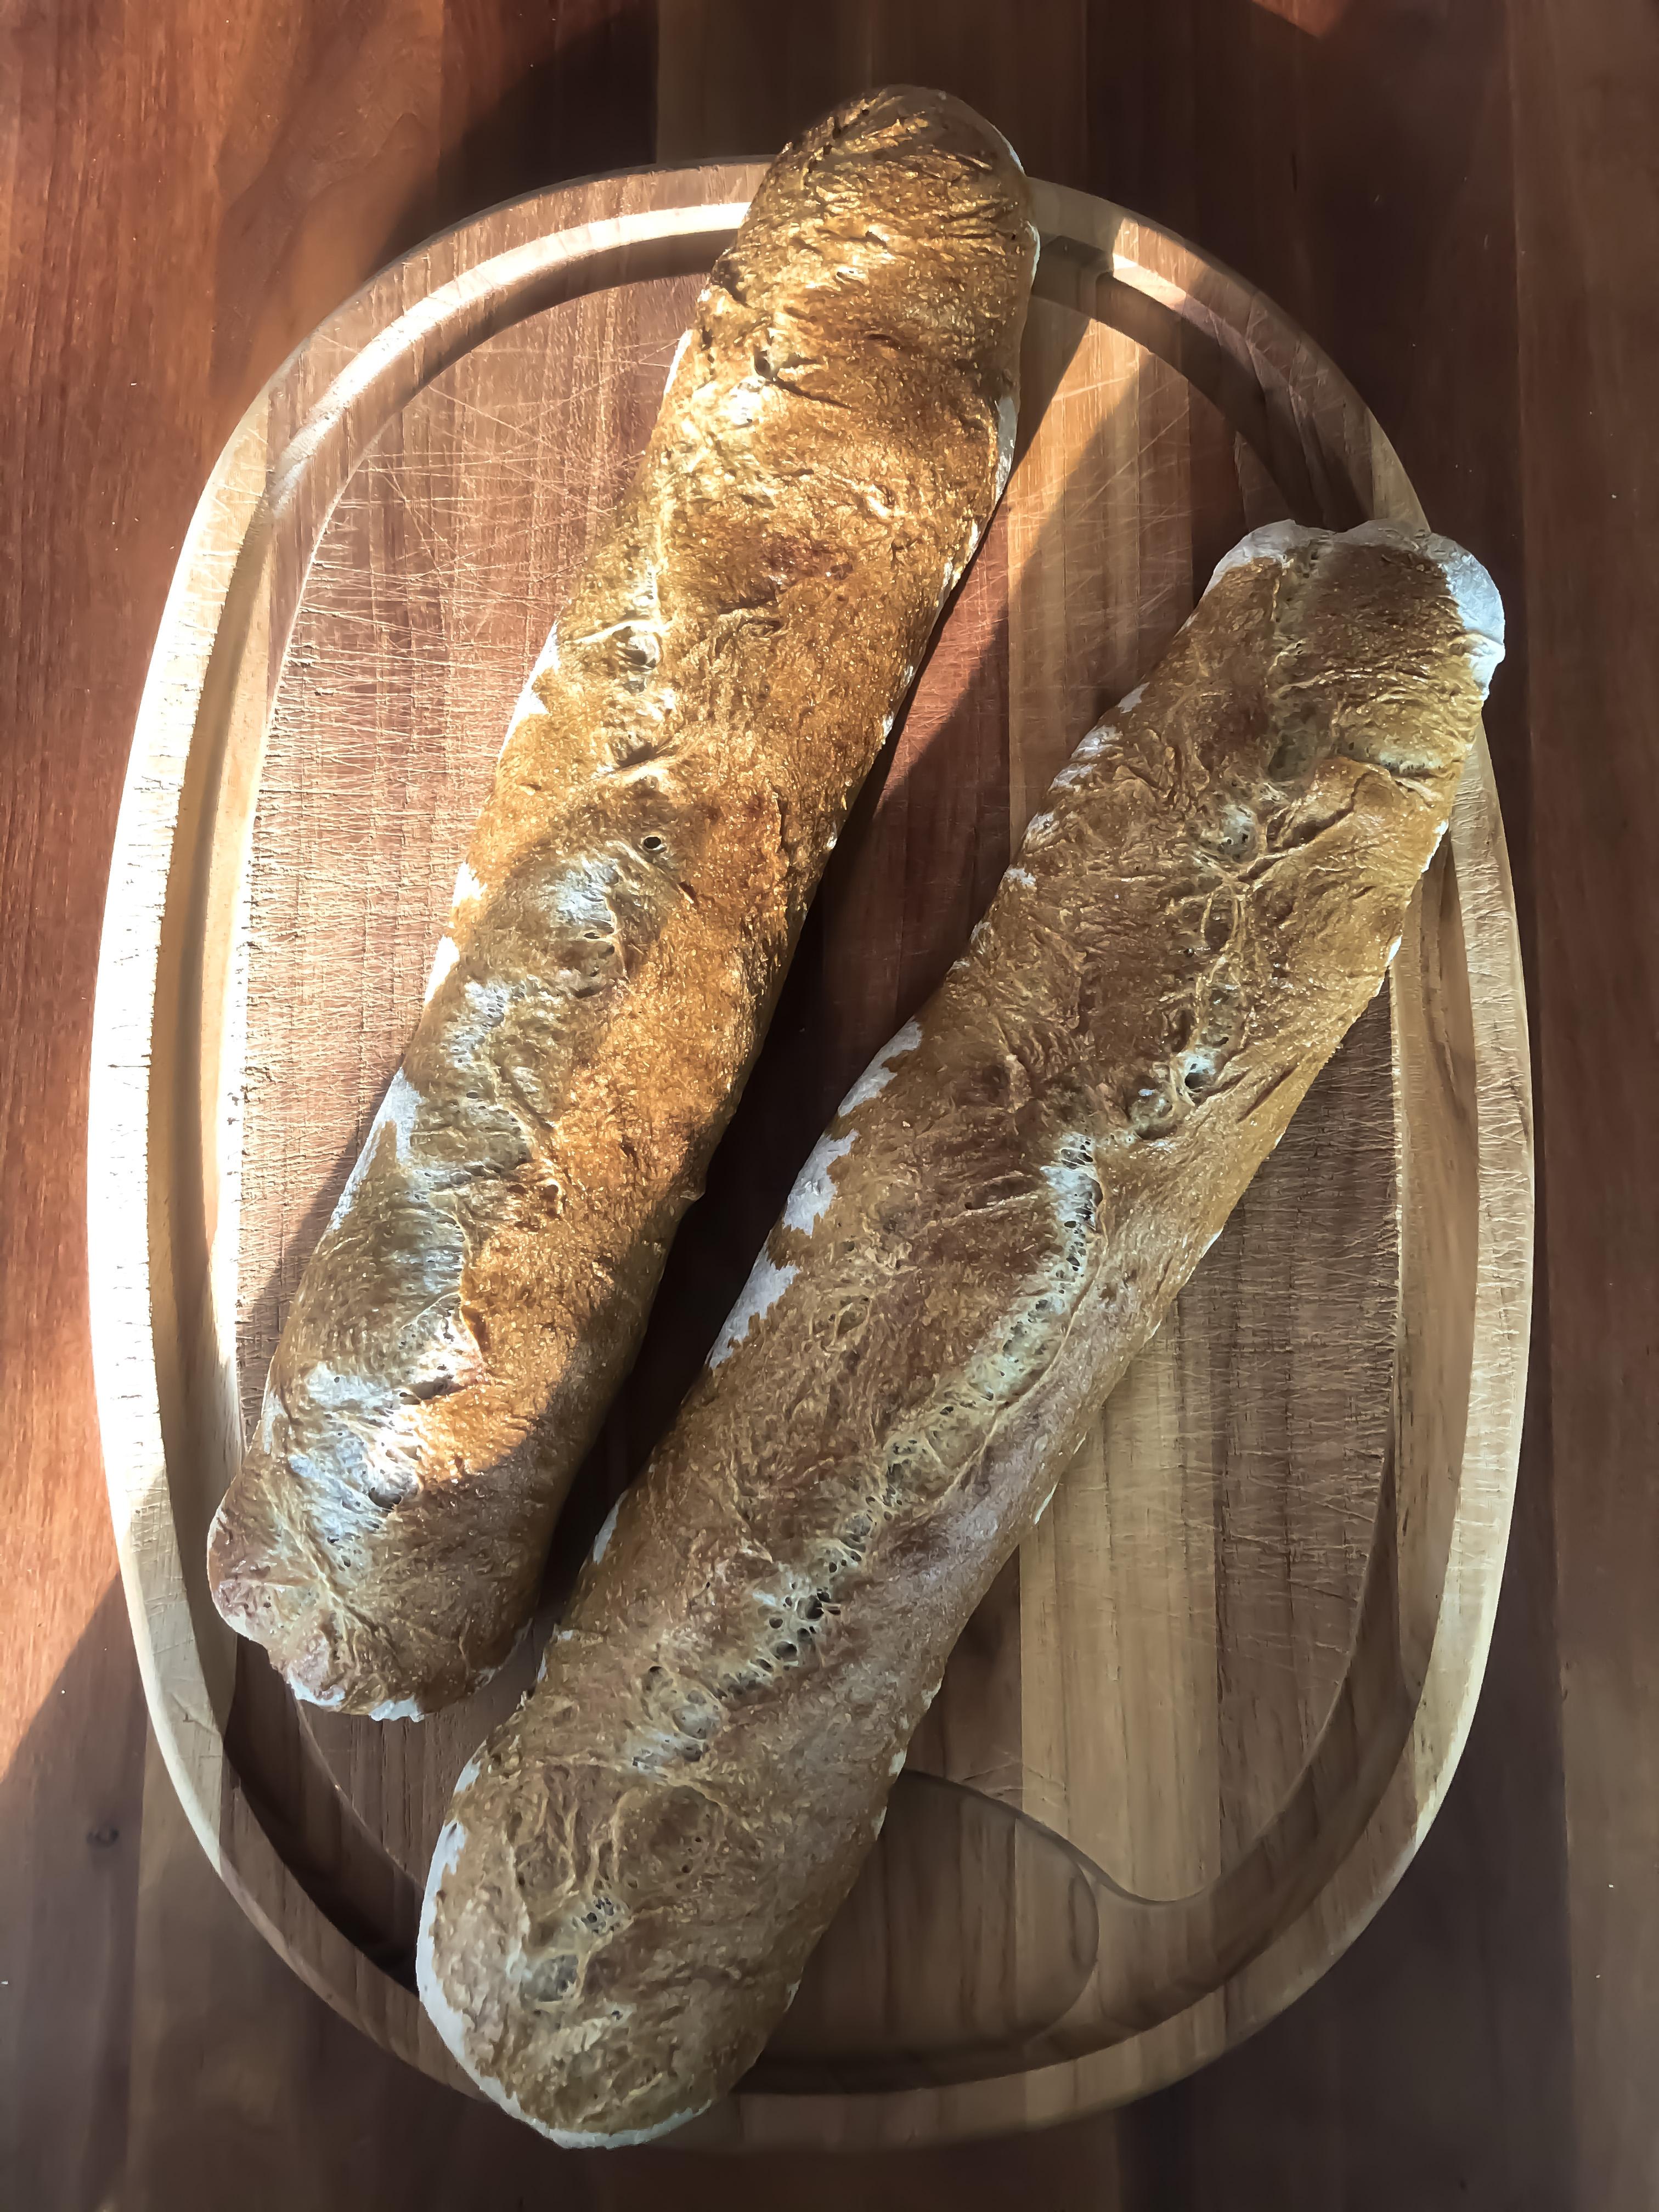 Flute with Agrain® 05 Smoked Super Grain Flour